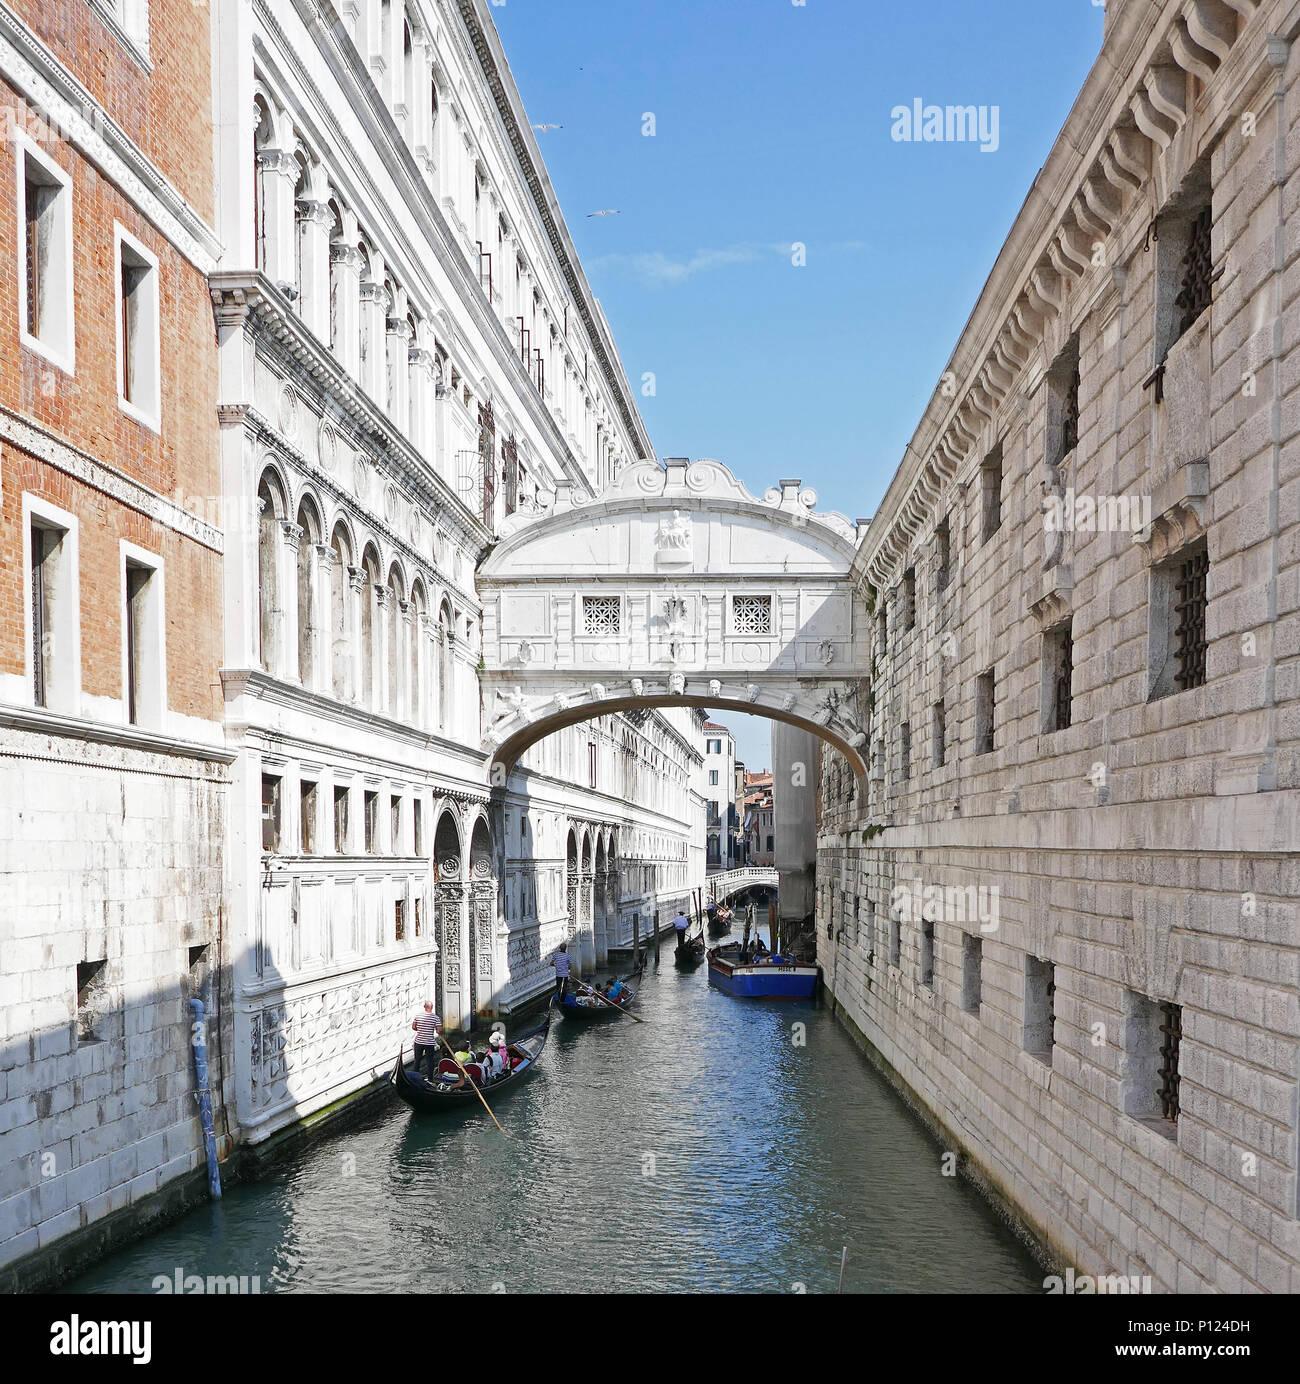 Bridge of Sighs Ponte dei Sospiri), Venice, Italy - Stock Image